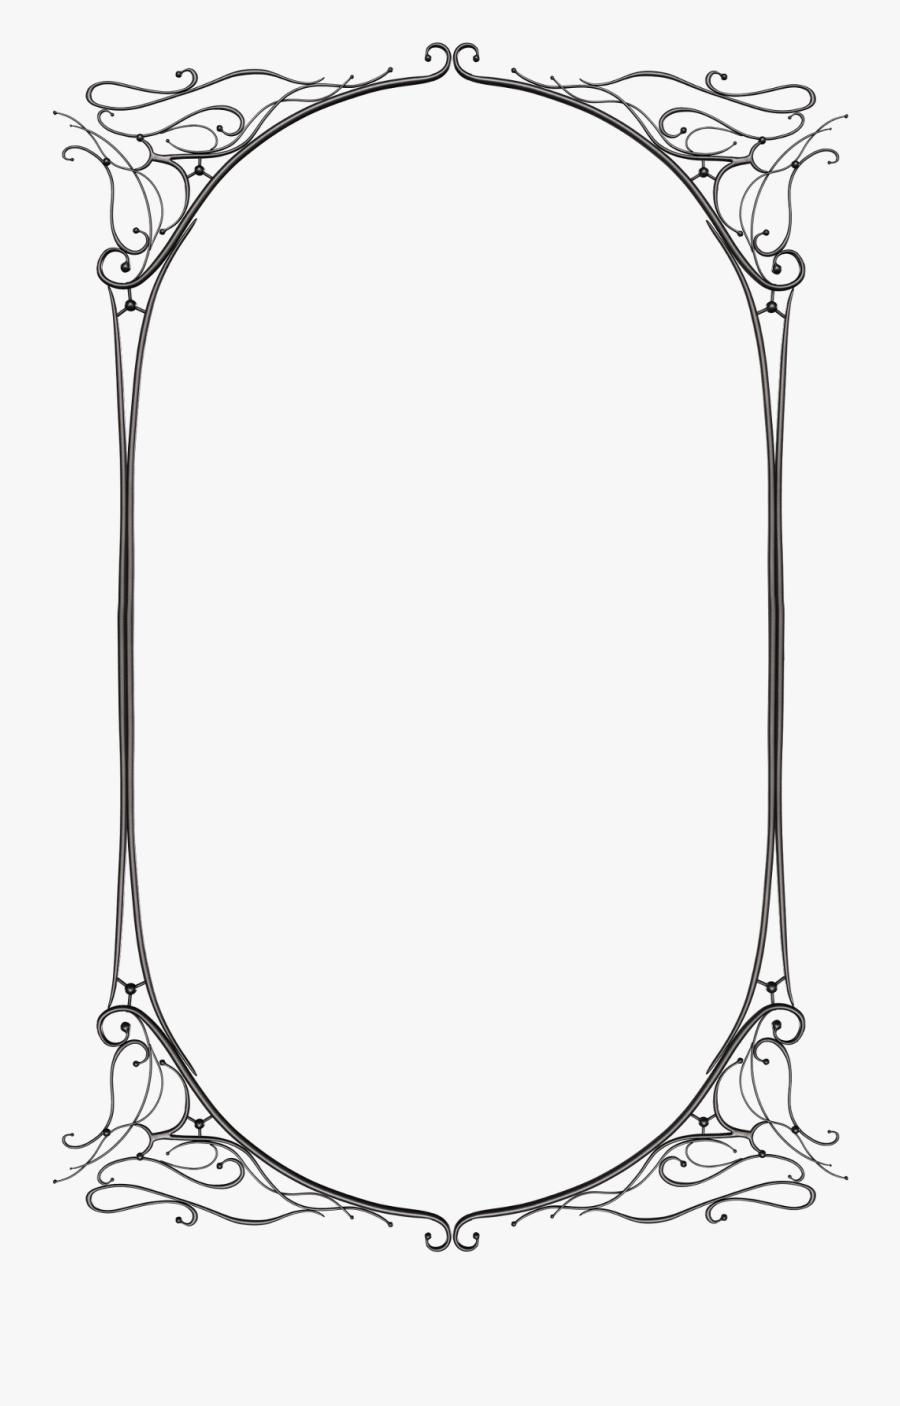 Transparent Rustic Frame Clipart - Transparent Fantasy Border, Transparent Clipart